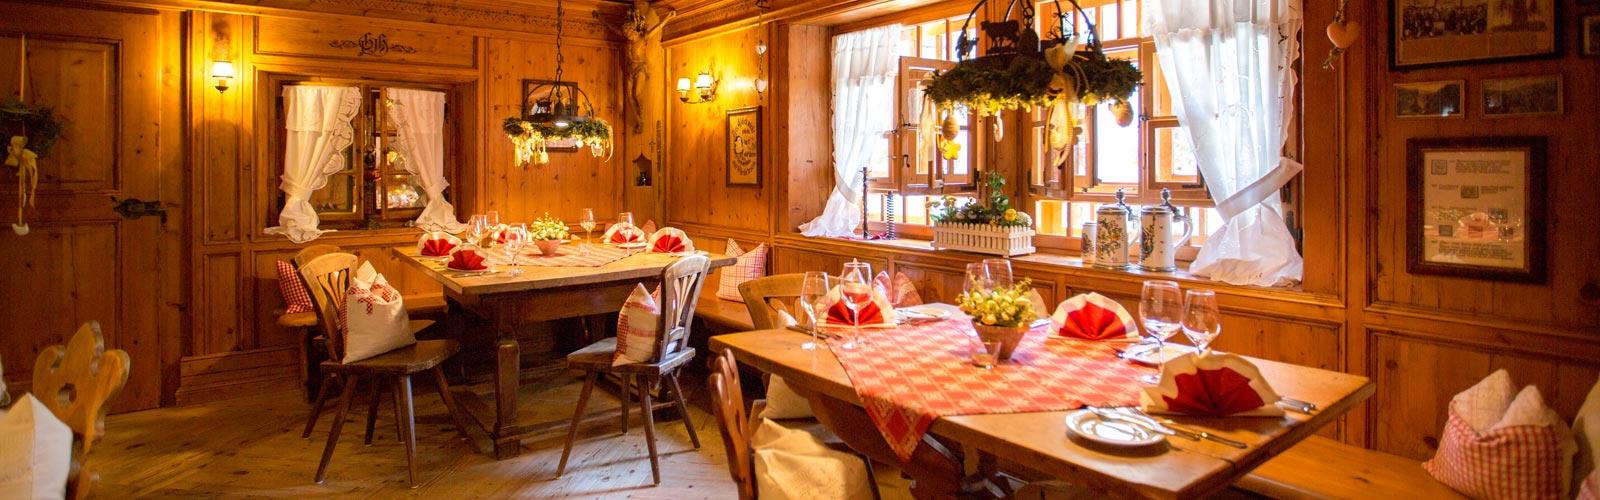 Adlerbad-Flair-Hotel-Dorfstube-1600x500px